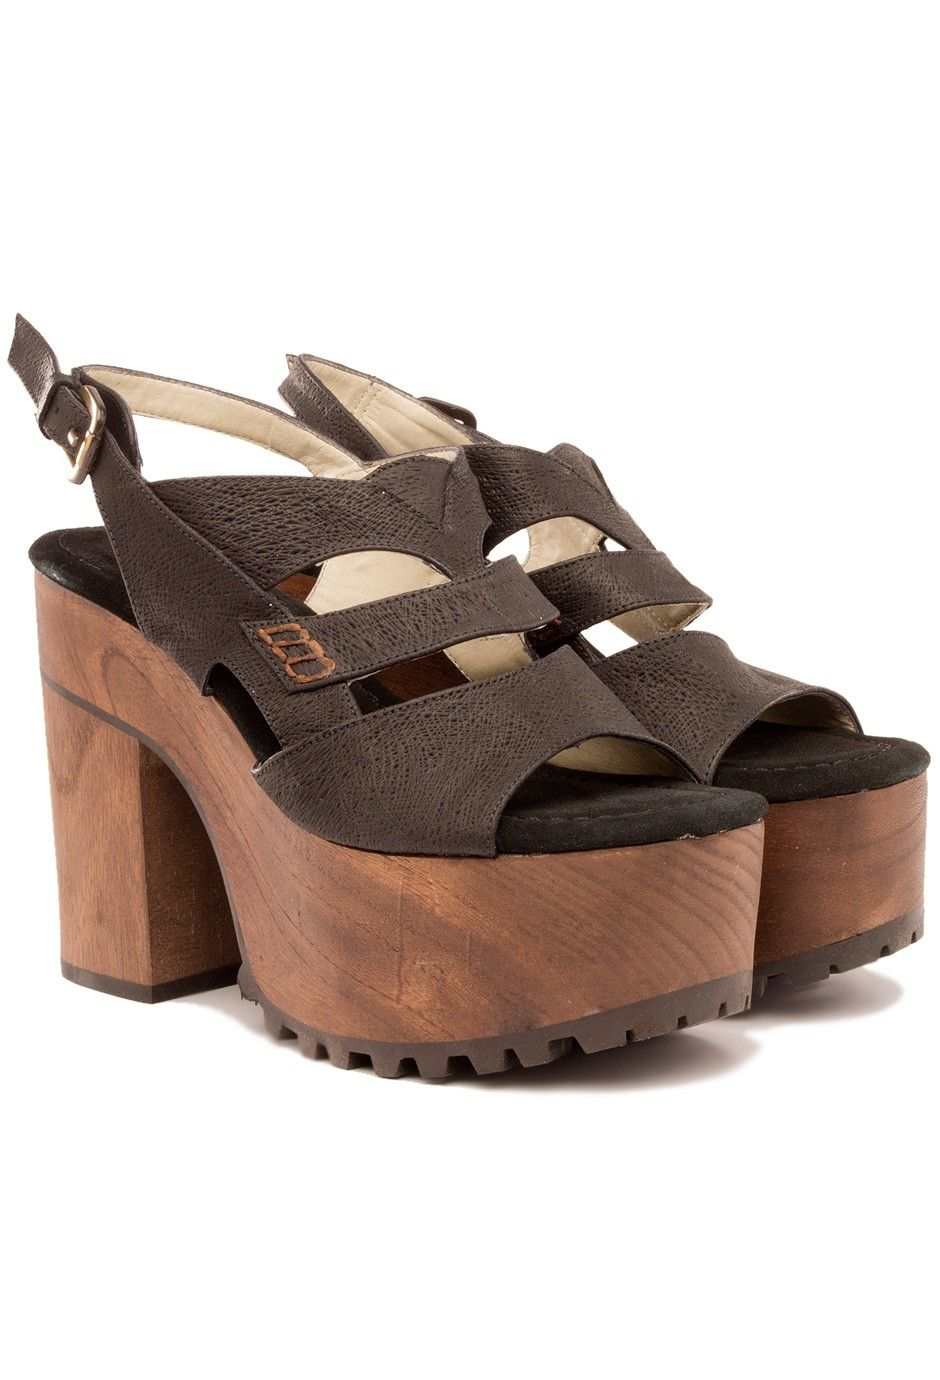 c3aa725402 Plataformas Gia negro - Pepe Cantero - online   Shoes   Zapatos ...